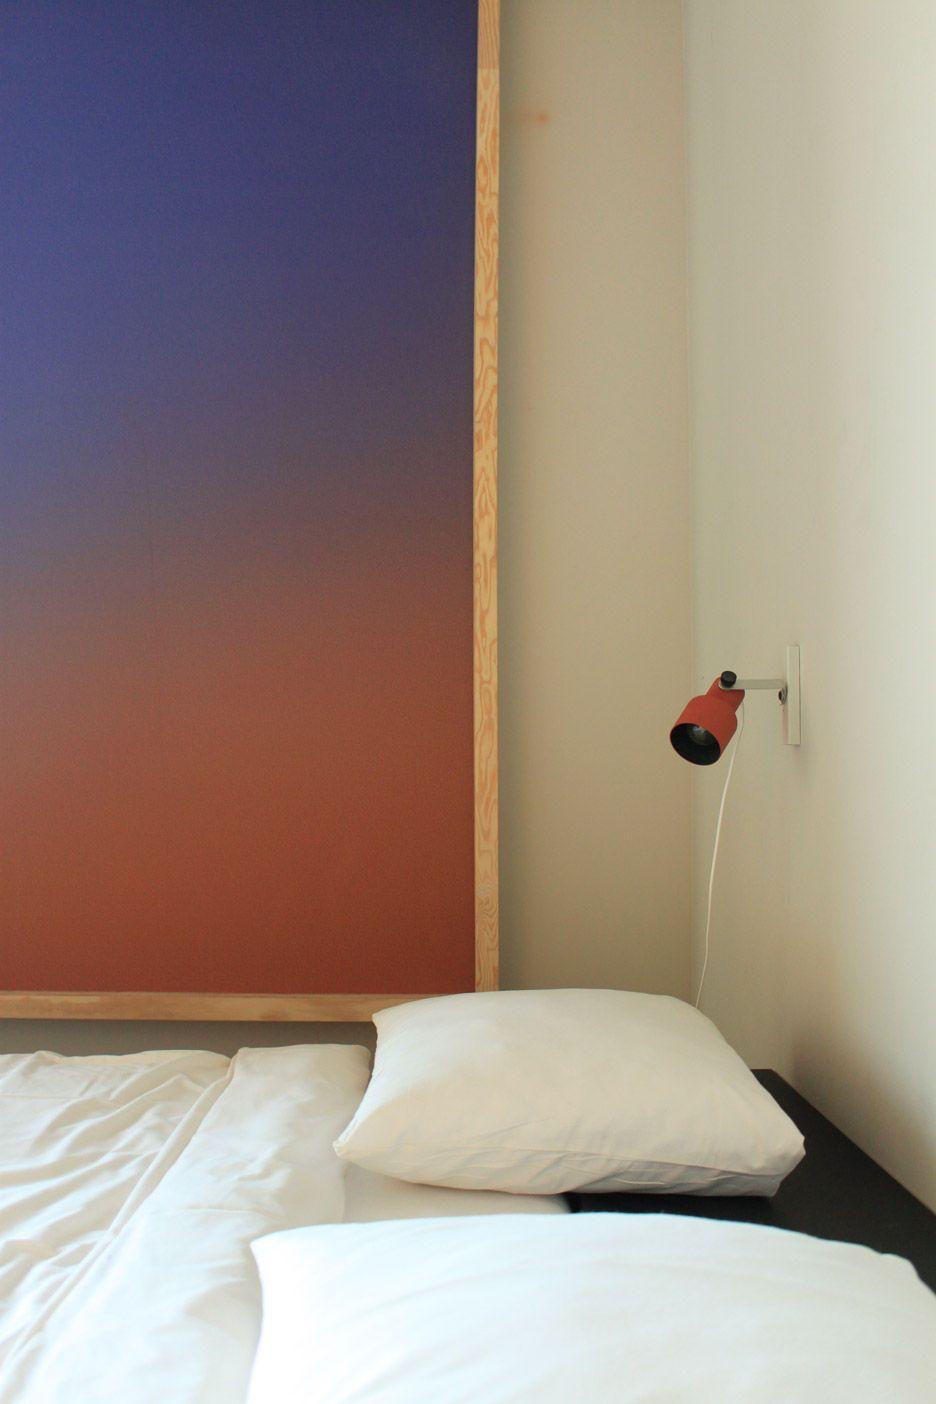 Hanna maringus volkshotel suite has a wooden bathtub and colourful